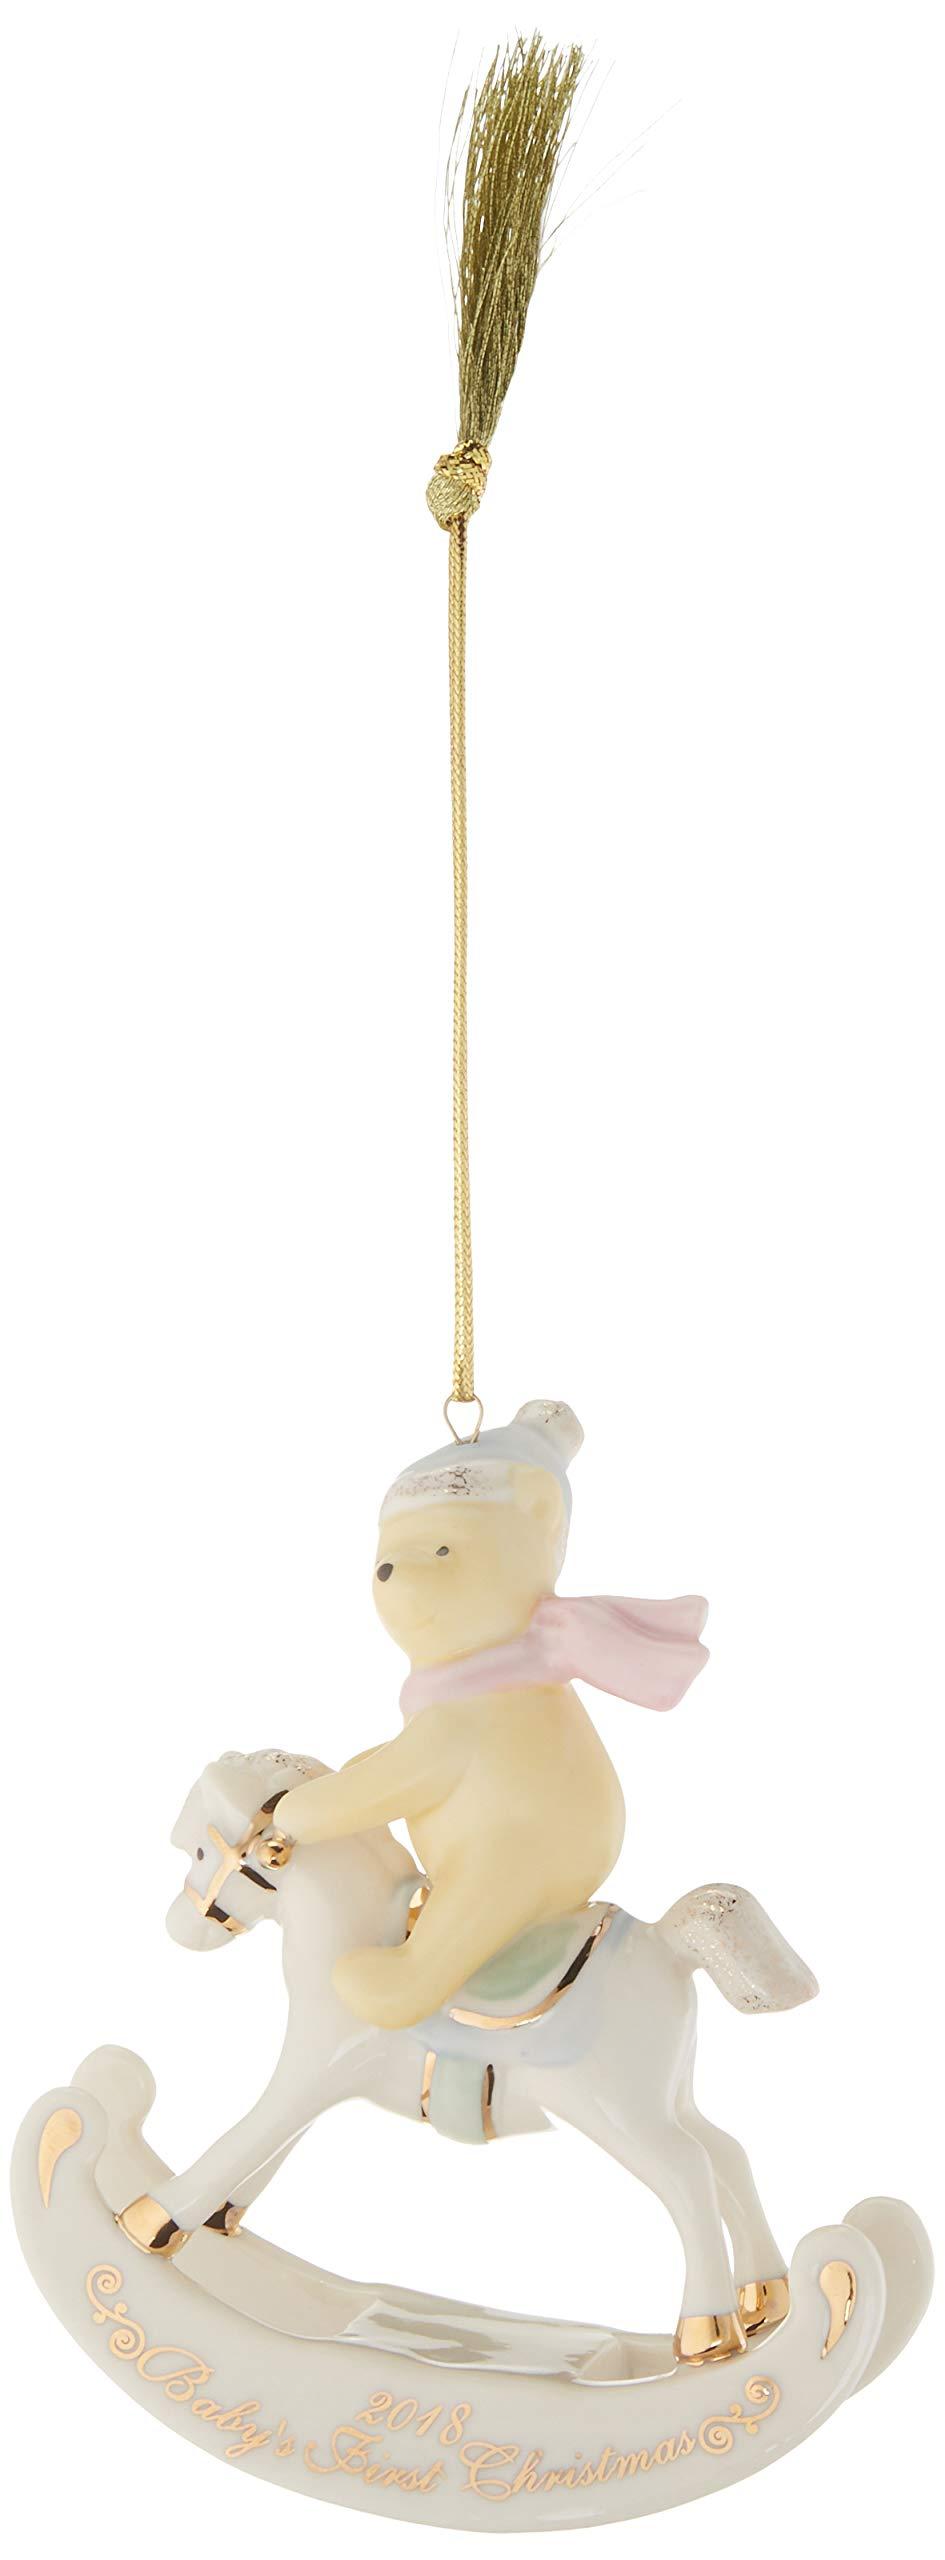 Lenox 2018 Winnie The Pooh Baby's 1st Christmas